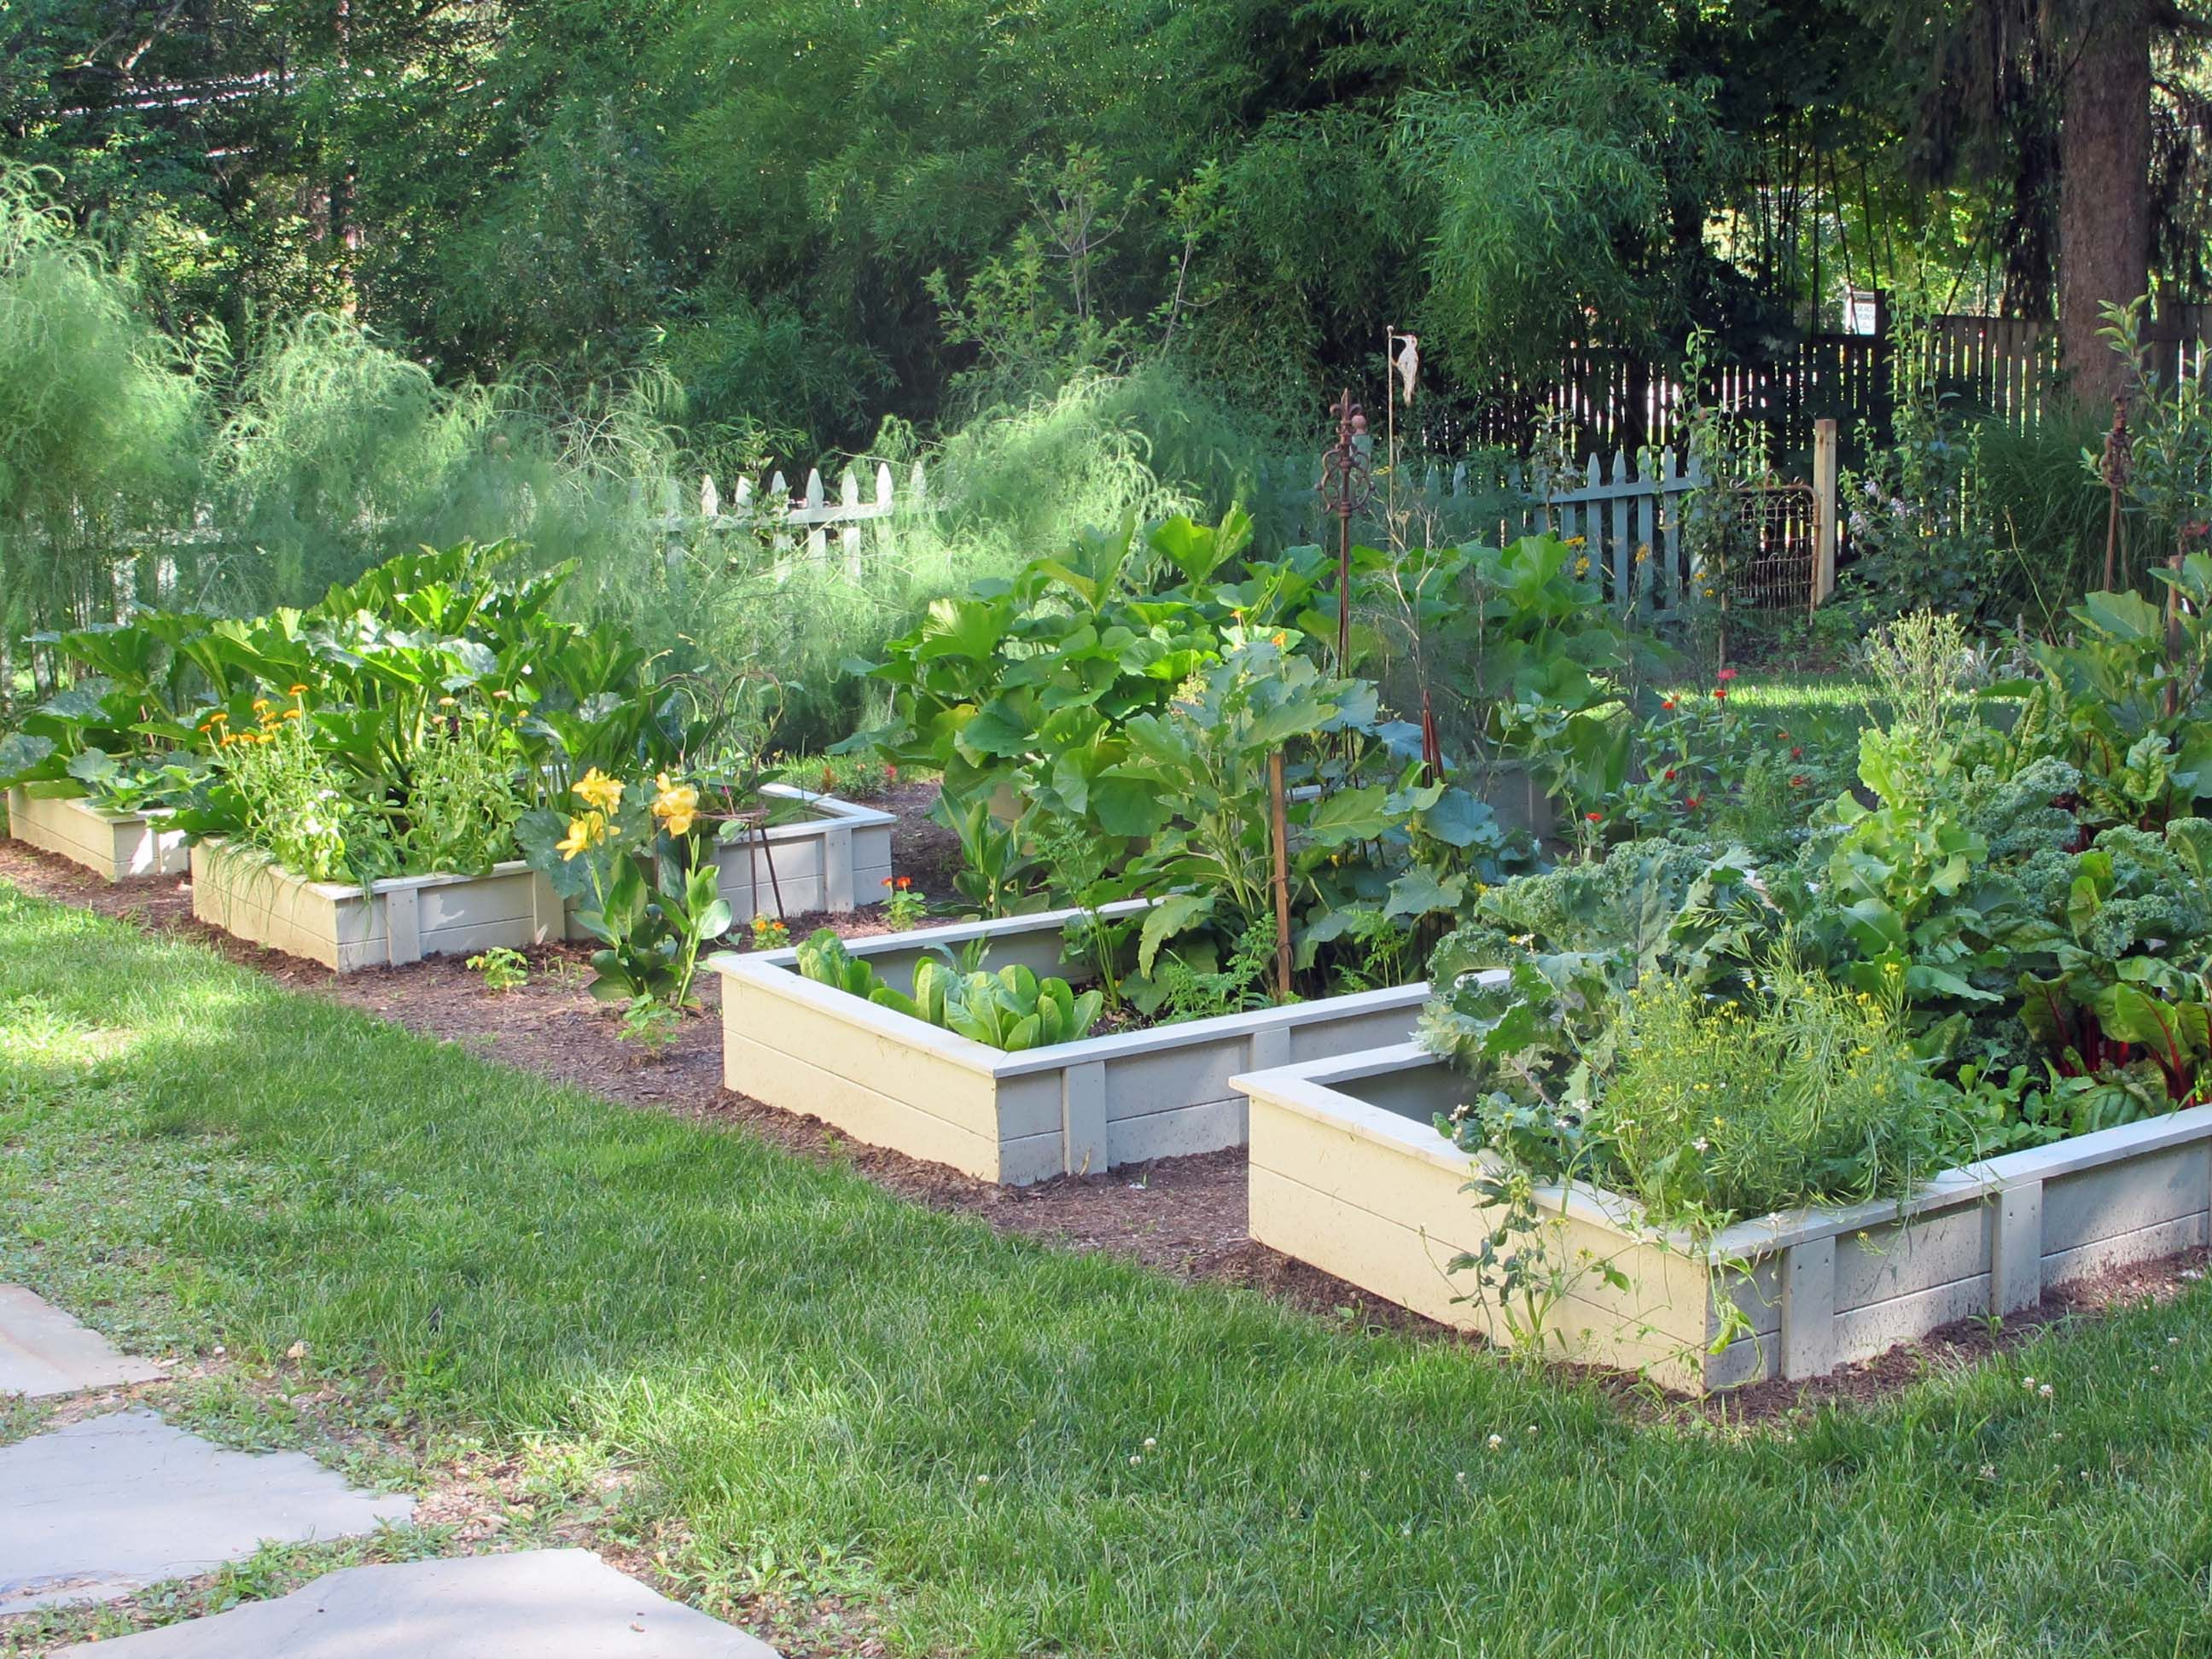 Raised Vegetable Garden Design Ideas | Veg Garden Beds 300x225 Slow Home  Living.